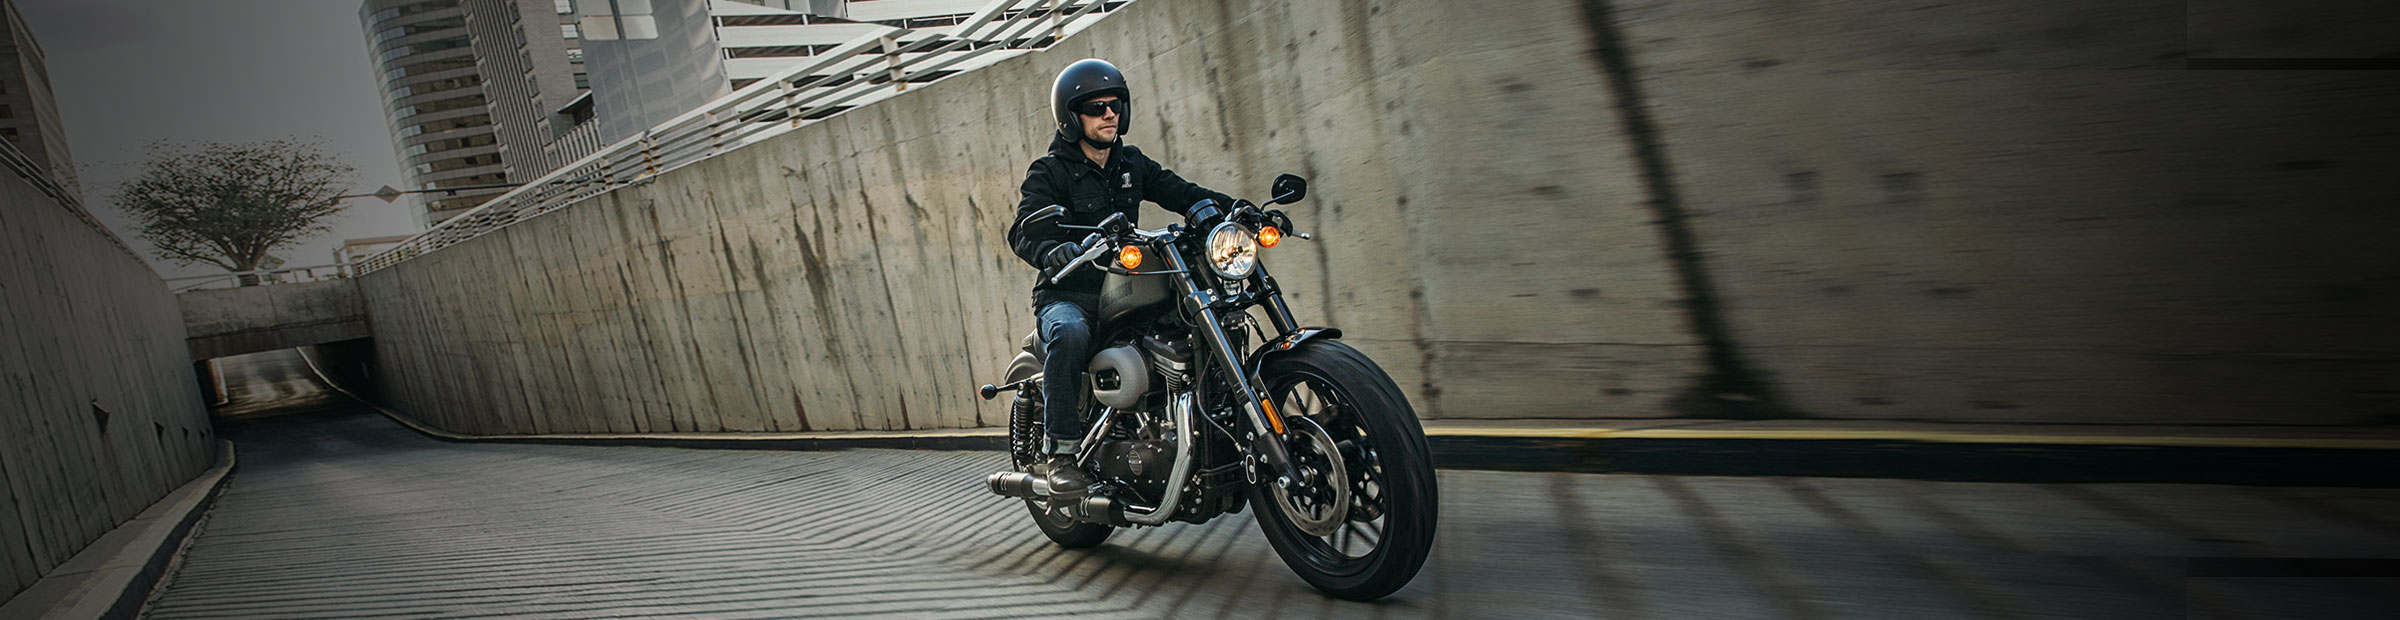 Rider to Rider